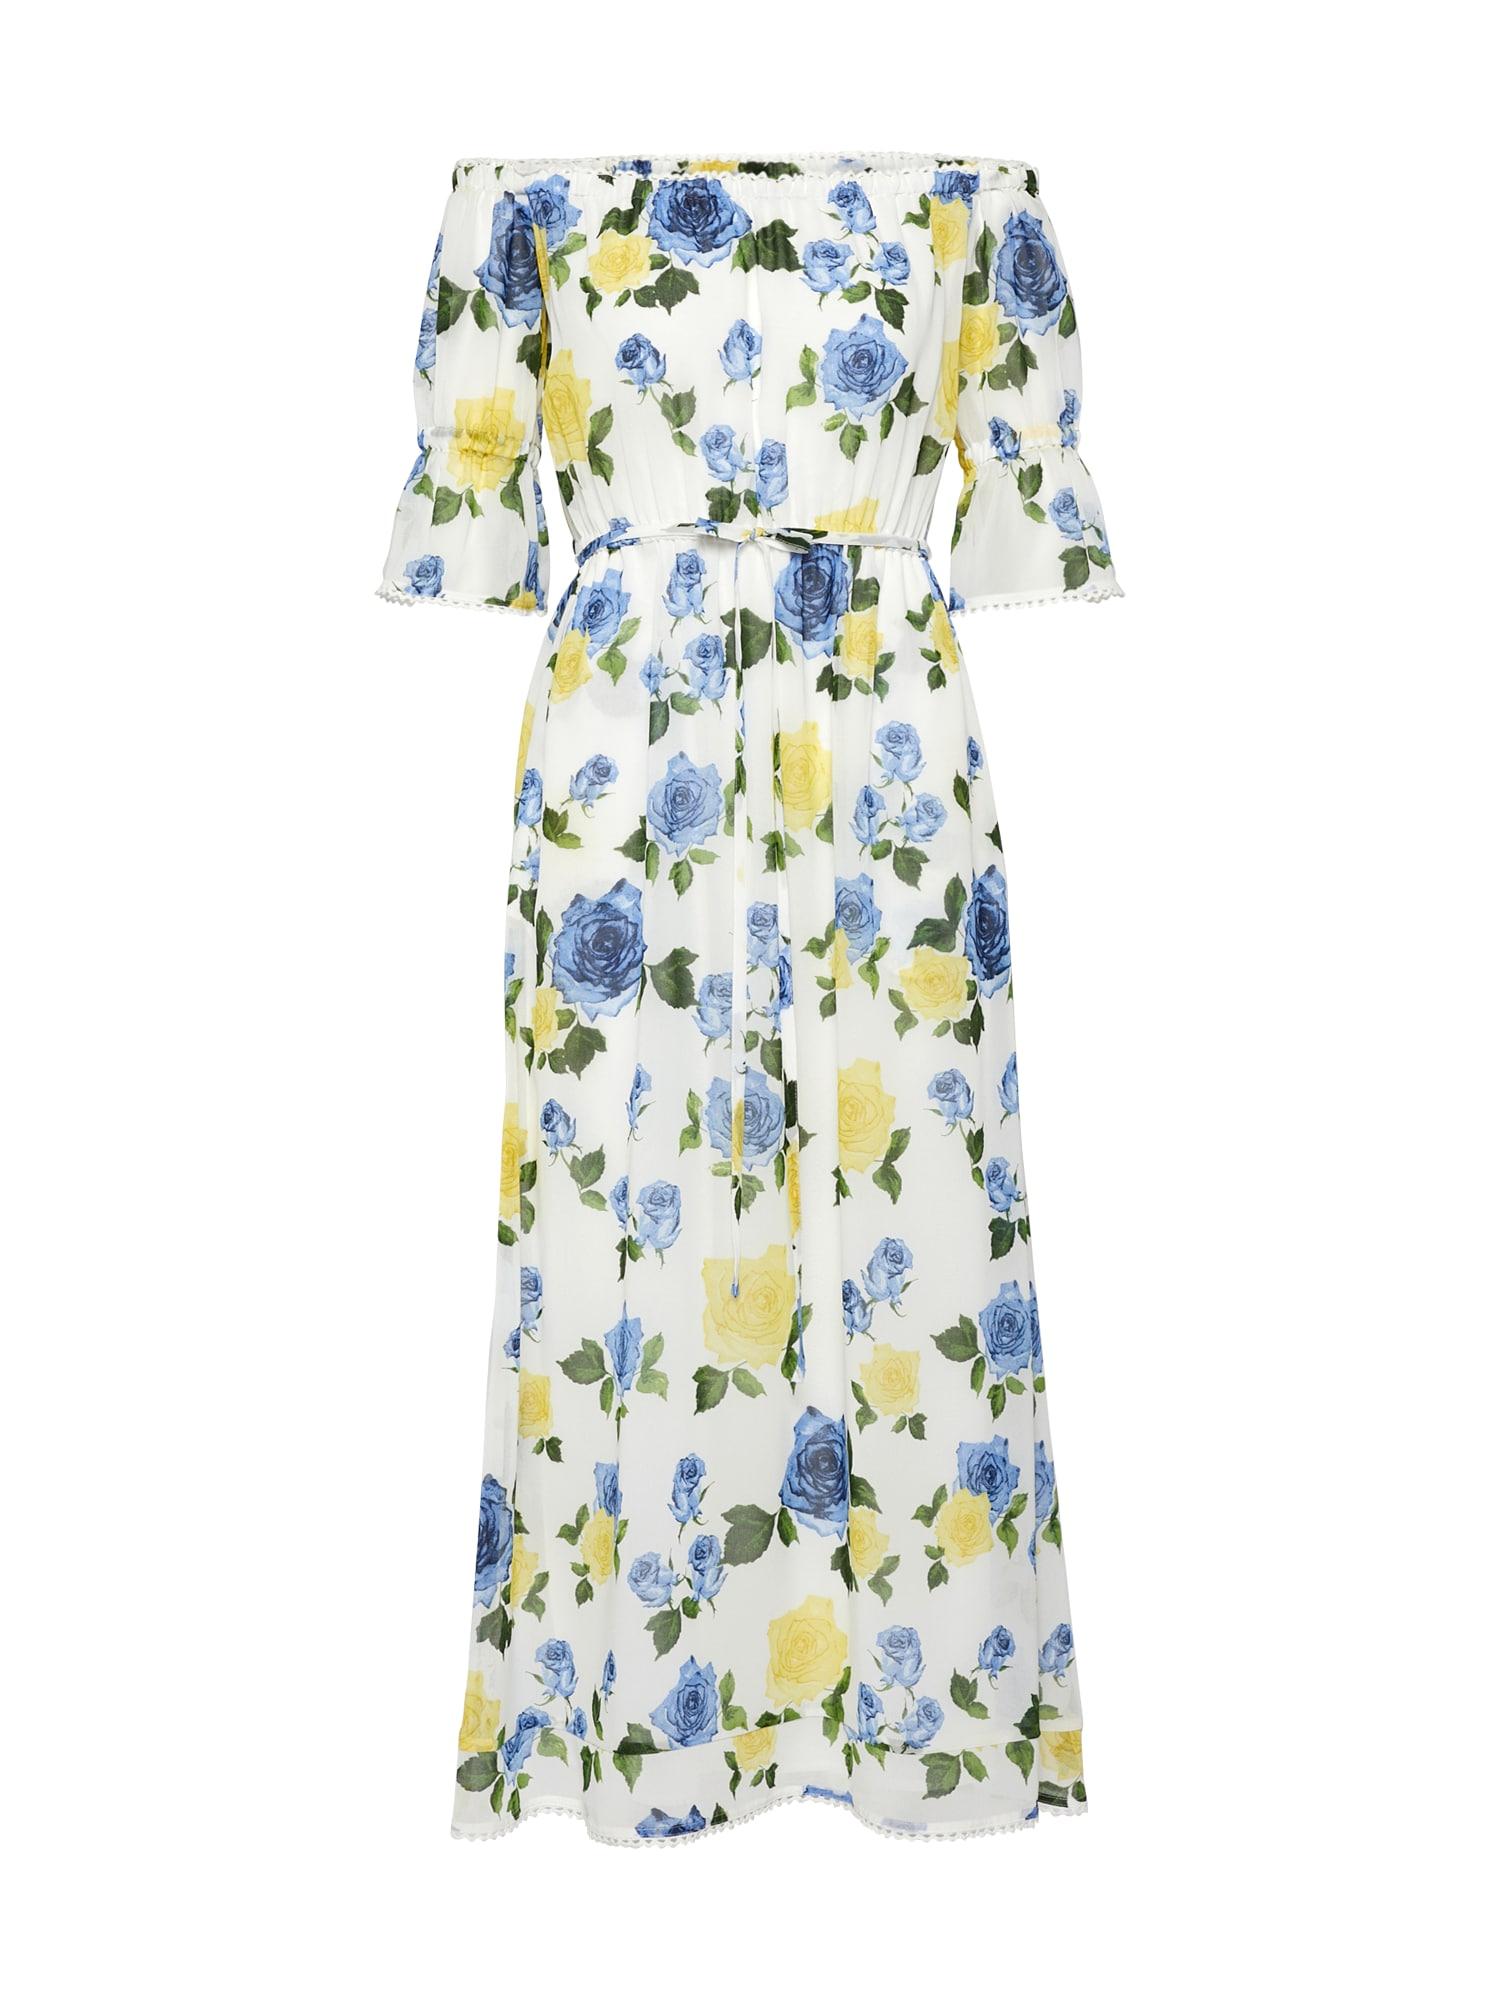 Letní šaty WILD ROSES ON MUSLIN PES MAXI DRESS bílá THE KOOPLES SPORT